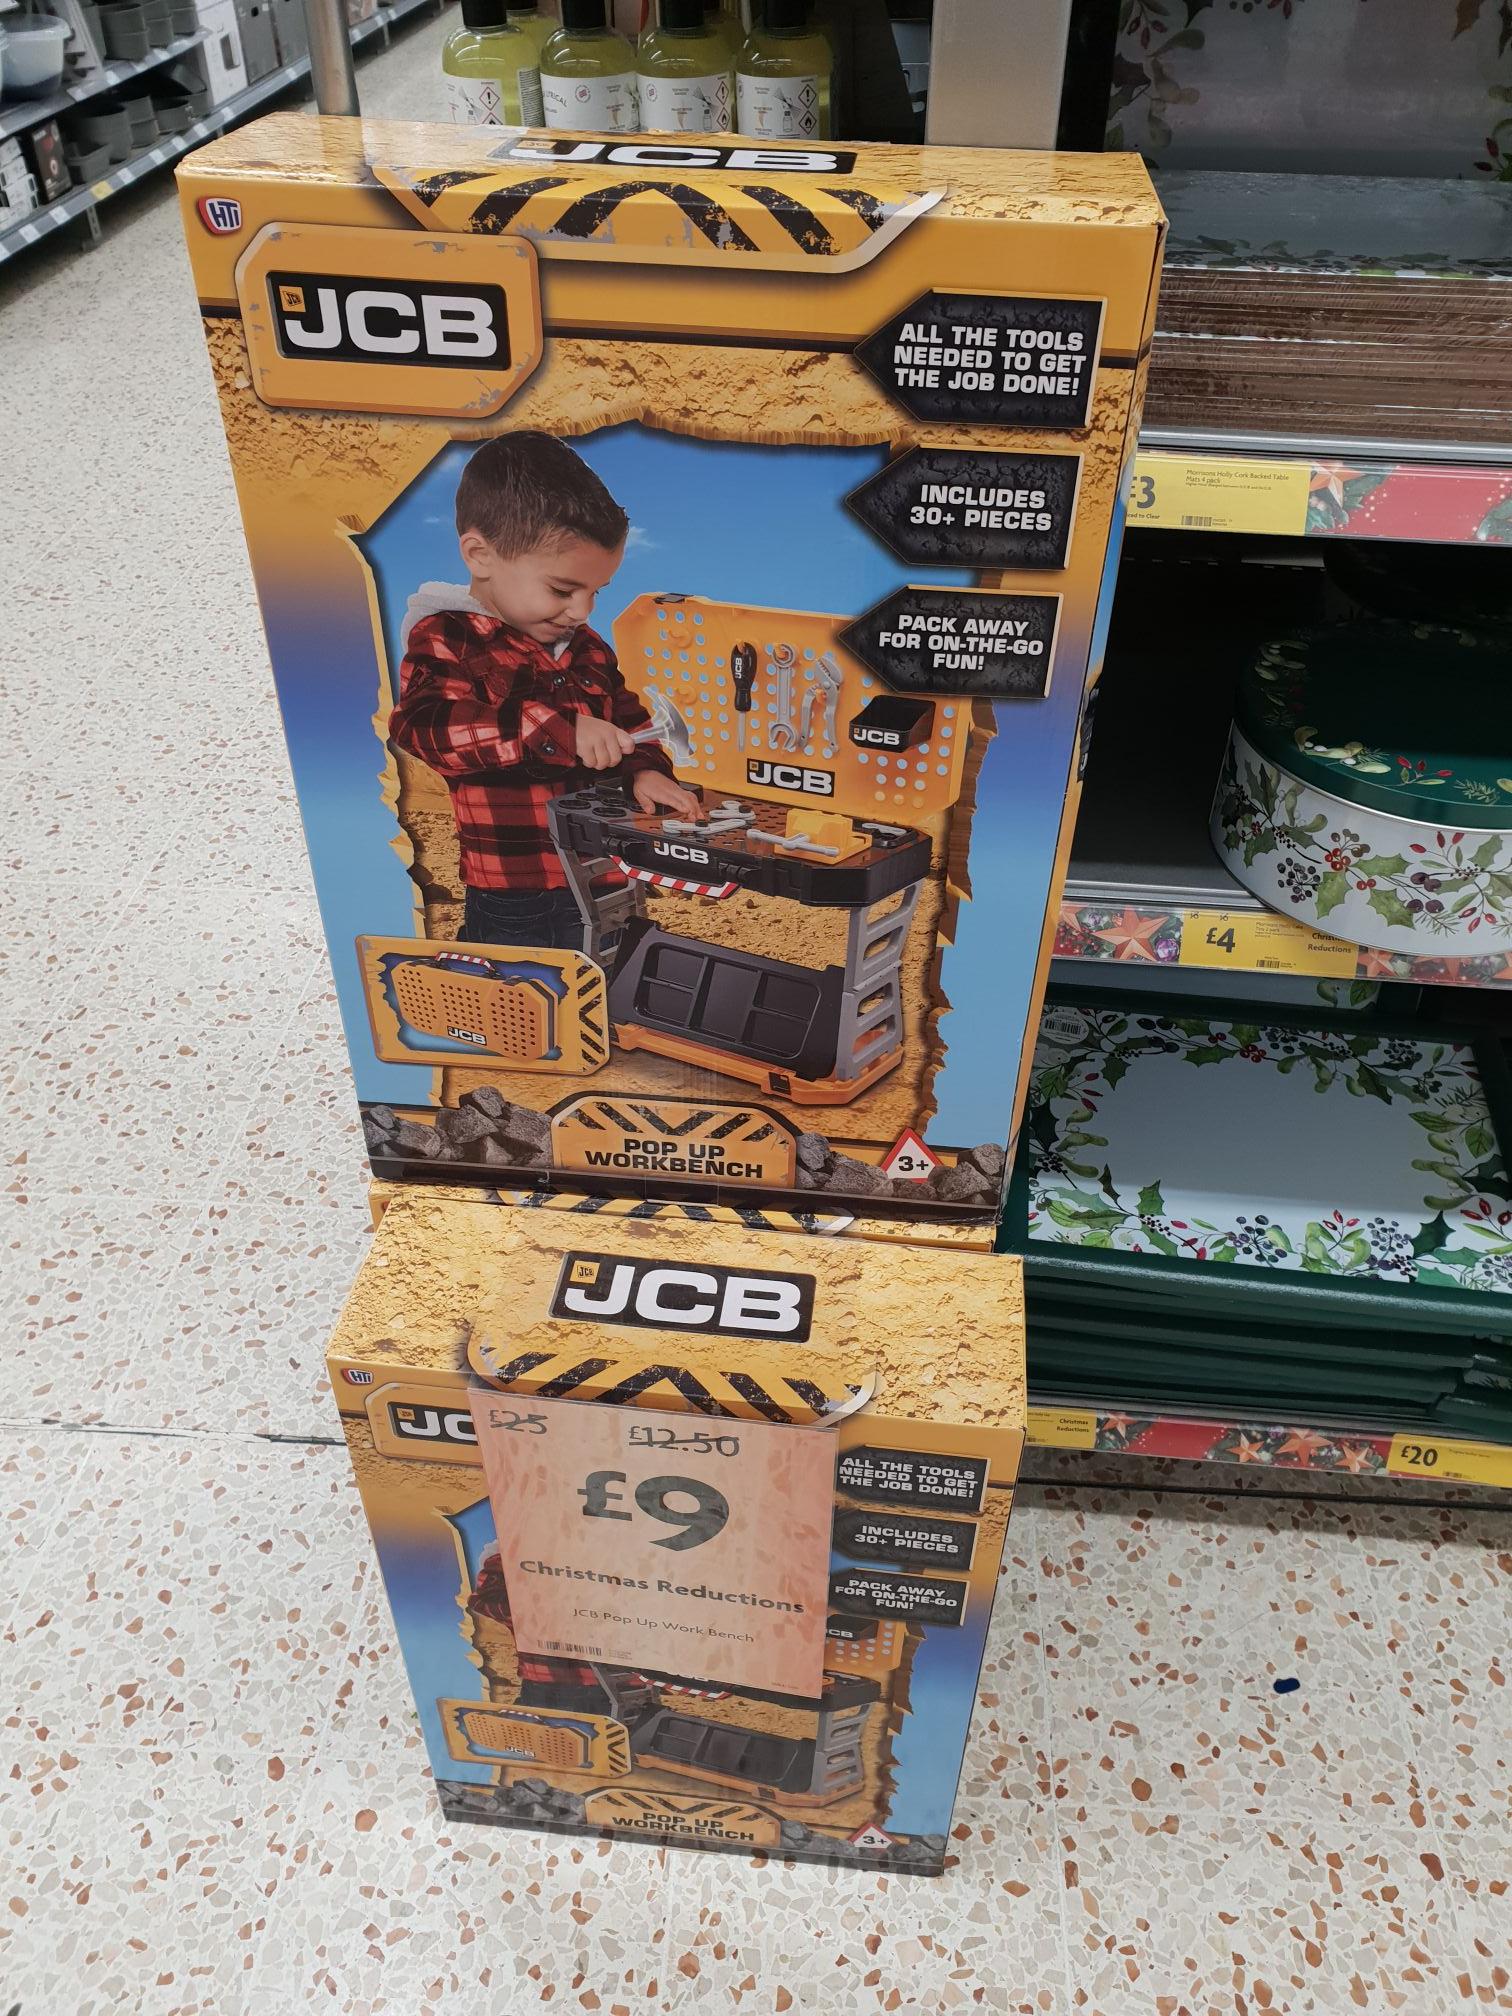 JCB Pop Up Workbench £9 Morrisons